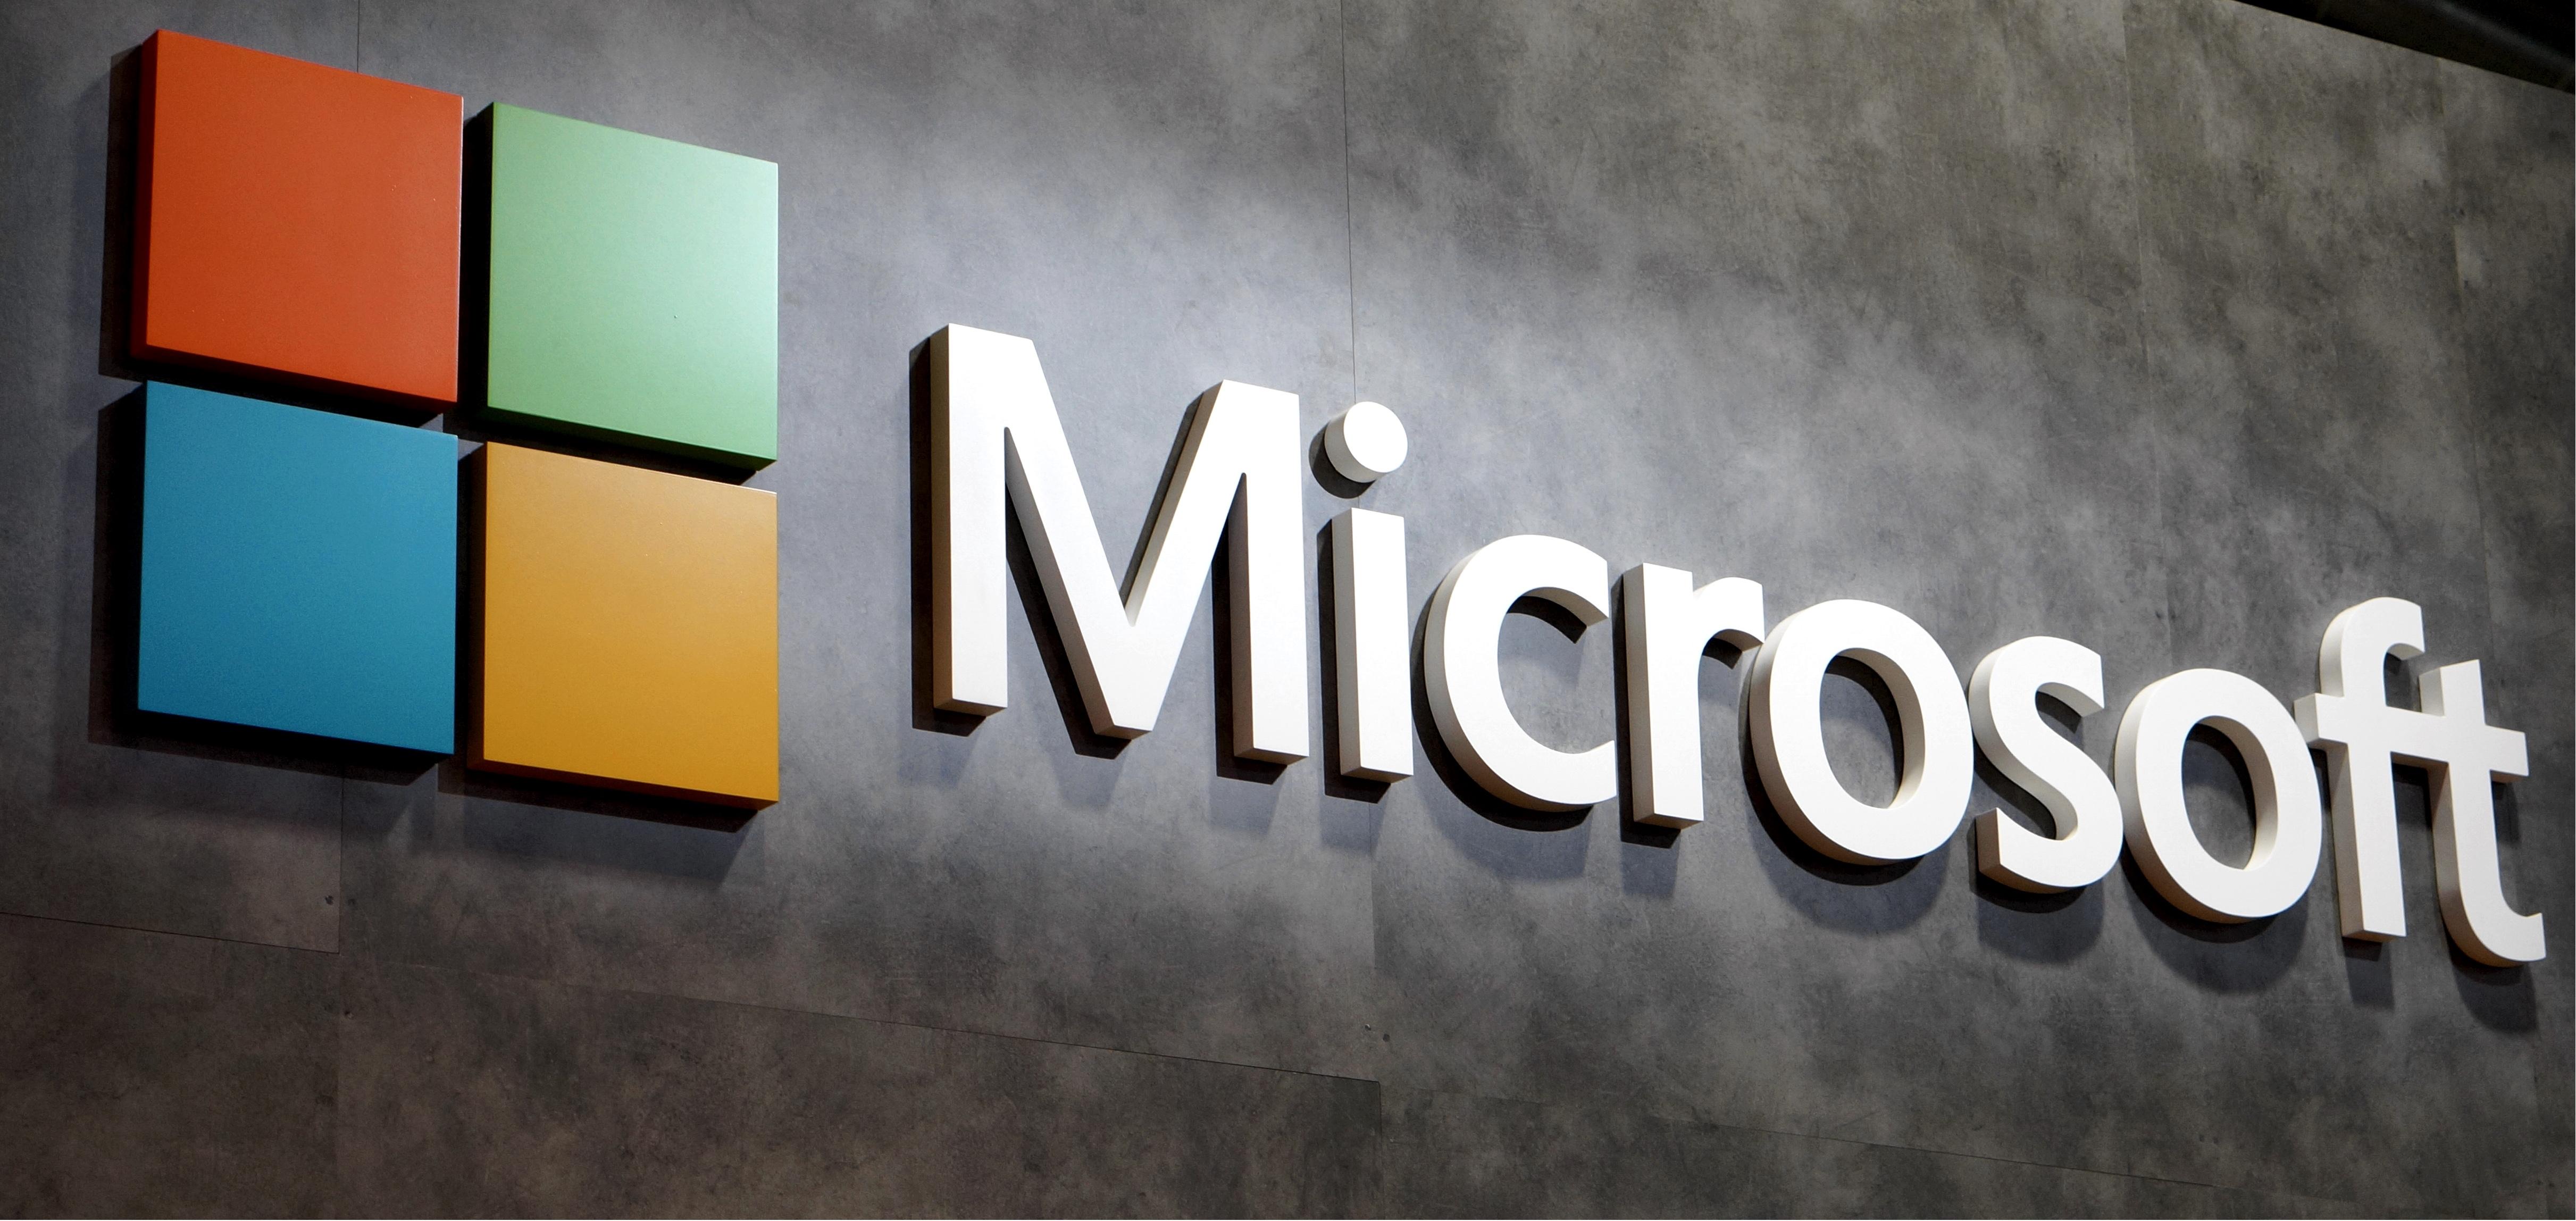 Microsoft Menjual Hak Cipta  Pada  Xiaomi, Membangun Kemitraan Jangka Panjang 1